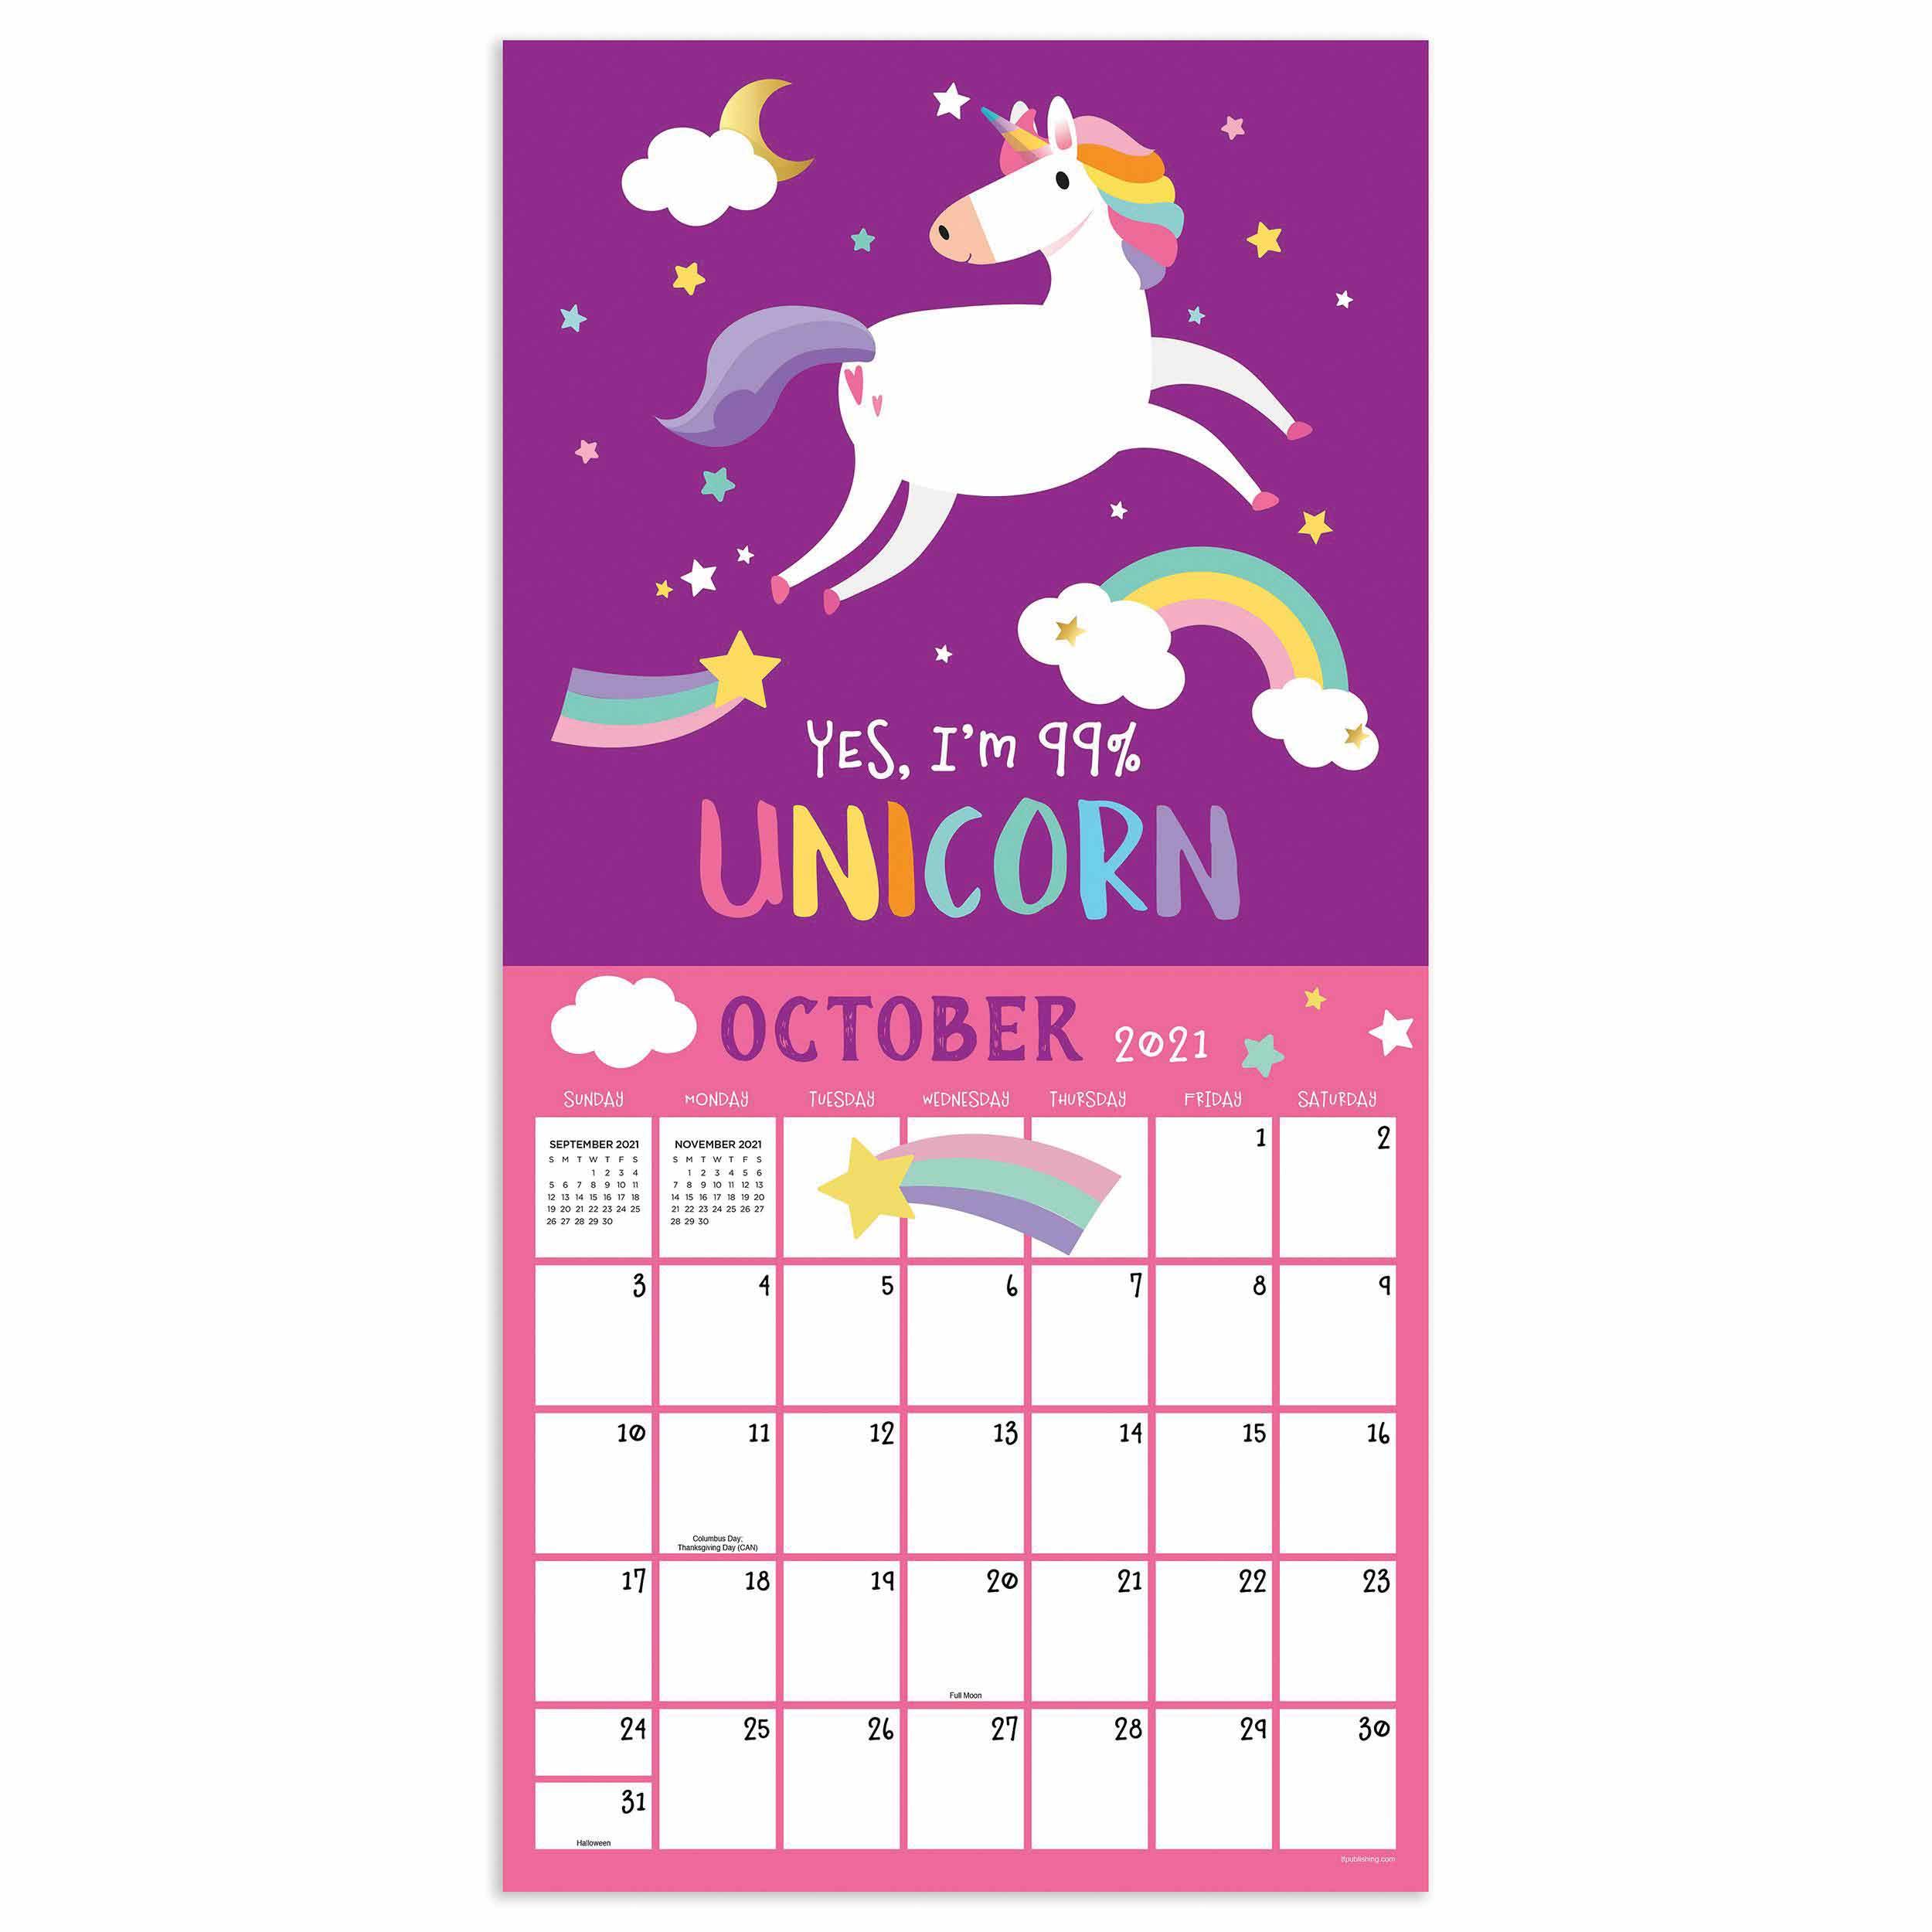 2021 Printable Unicorn Calandar   Calendar Printables Free